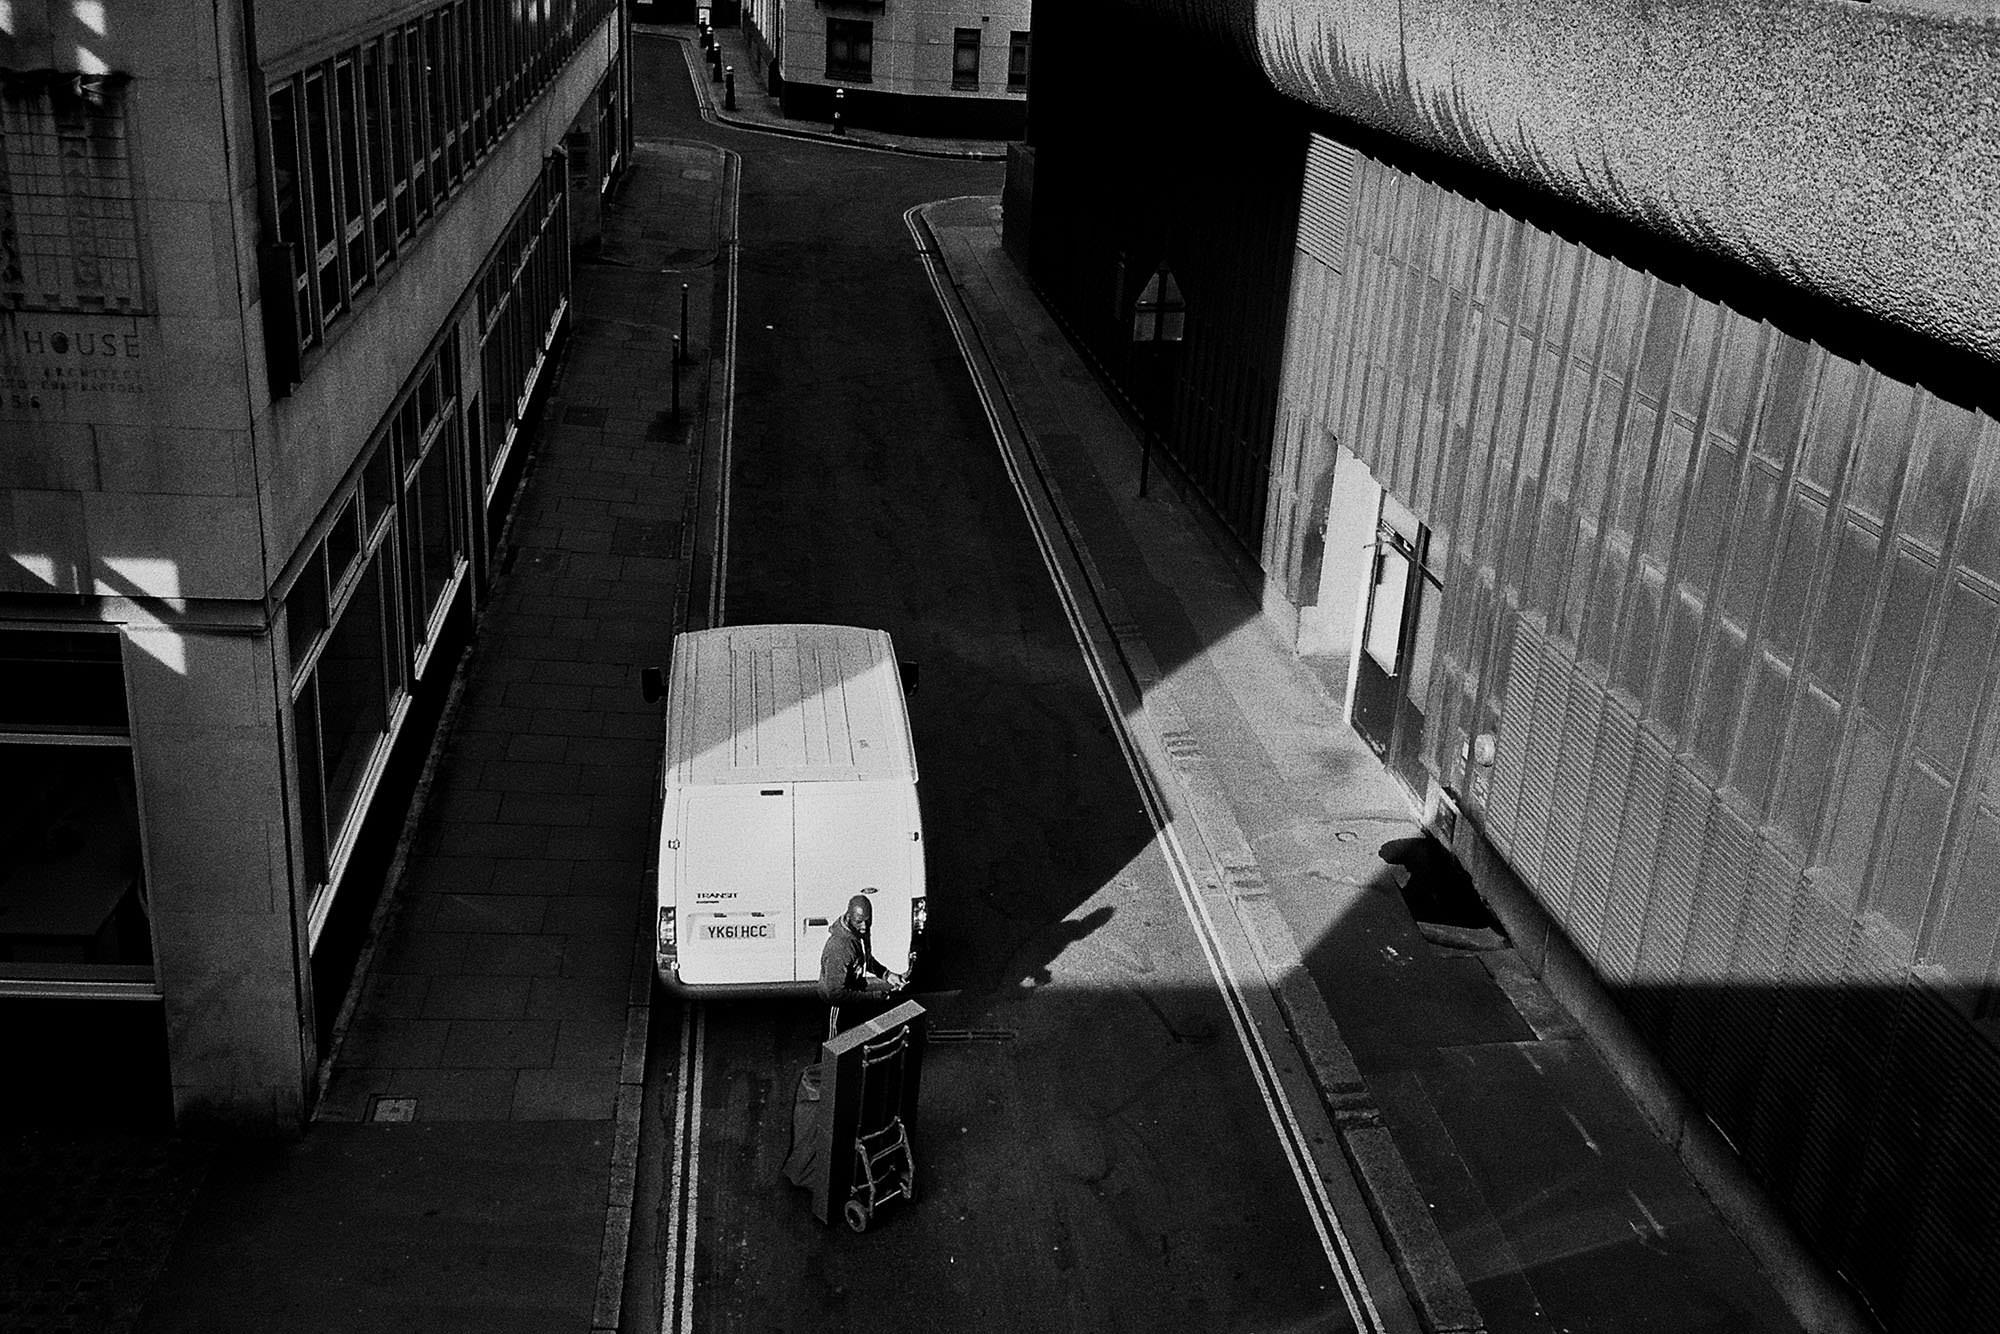 barbican-van-man-light-and-shadow